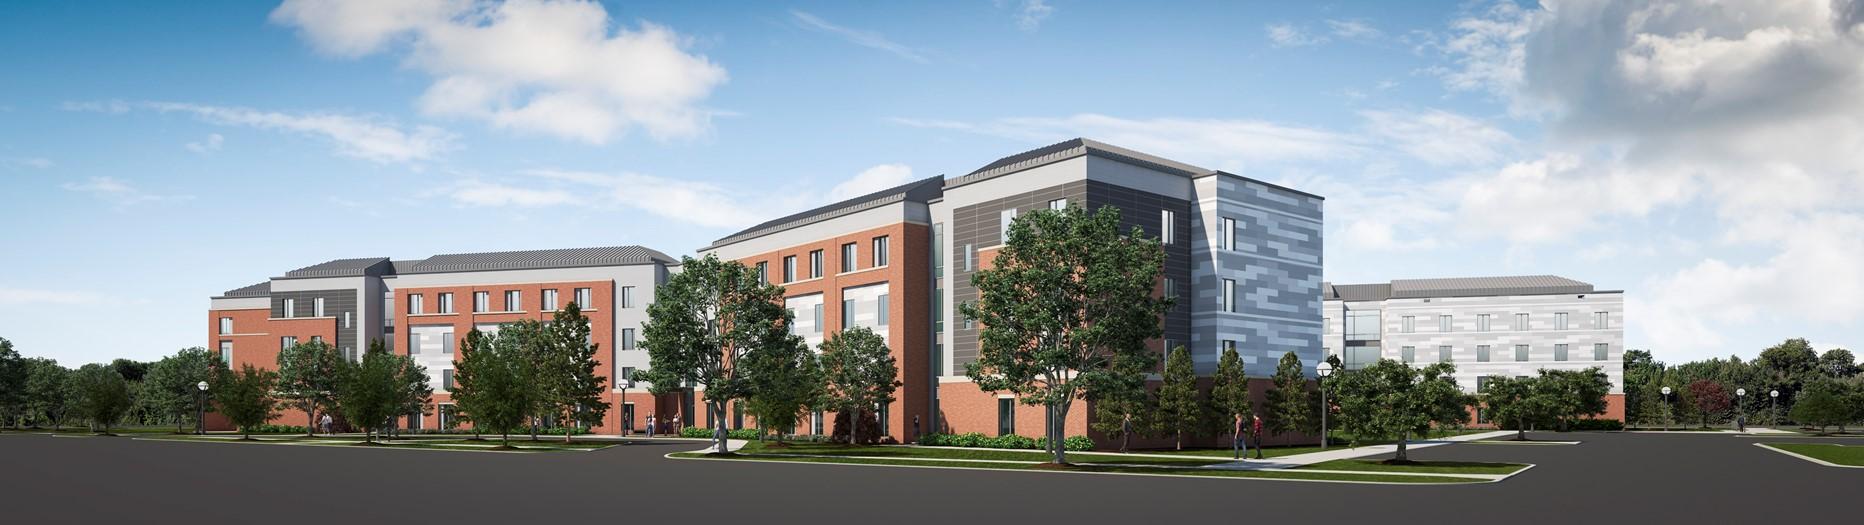 NSU New Residence Hall